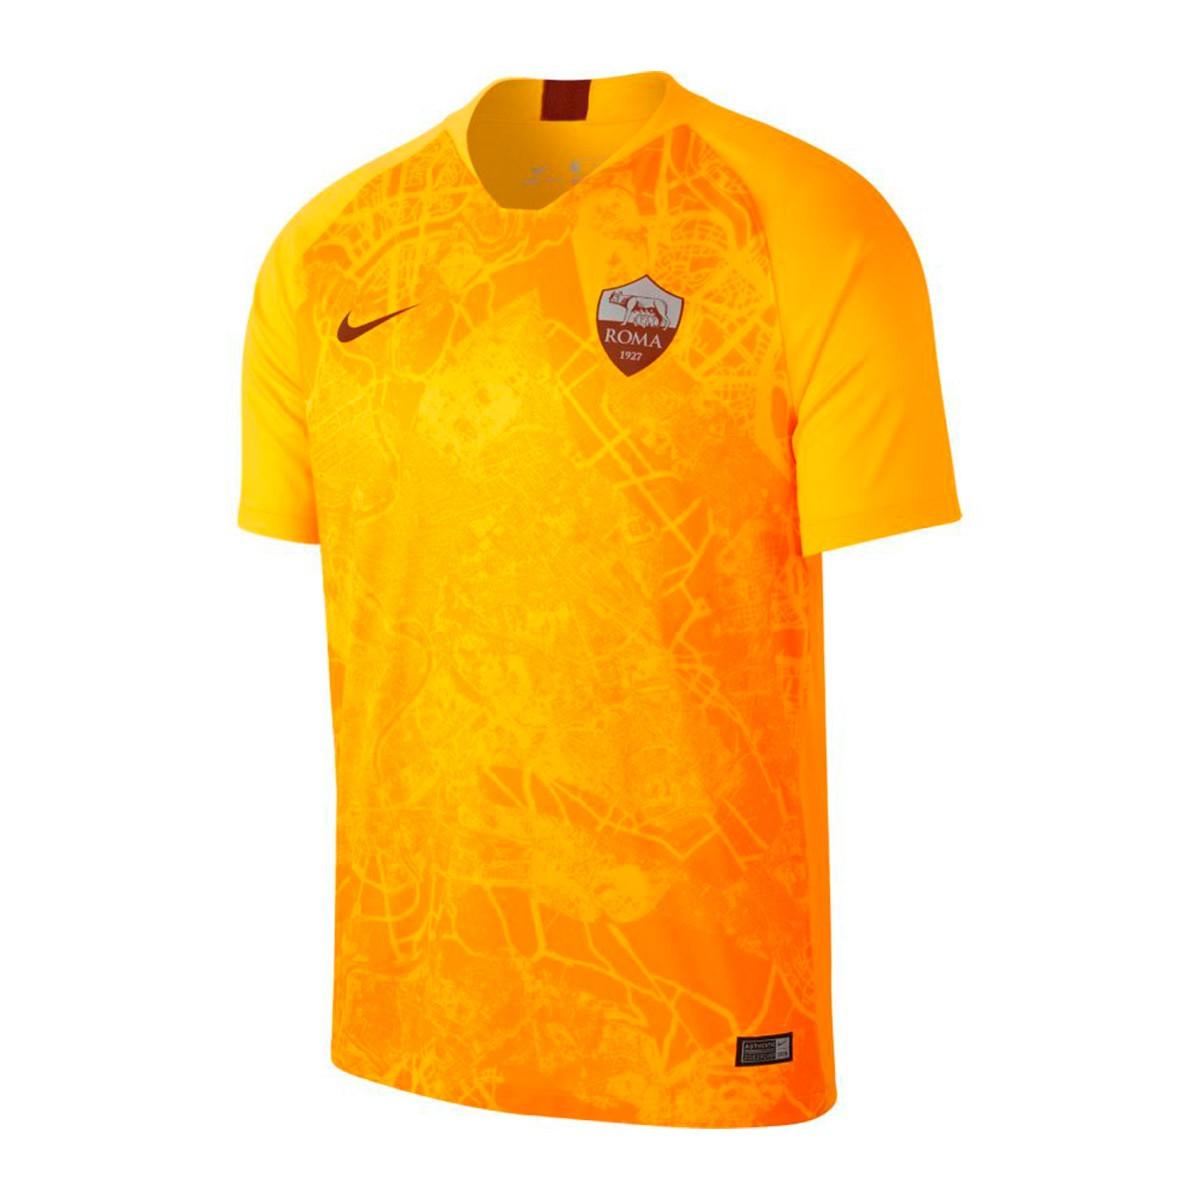 Playera Nike AS Roma Stadium Tercera Equipación 2018-2019 University ... d9f35e675152f